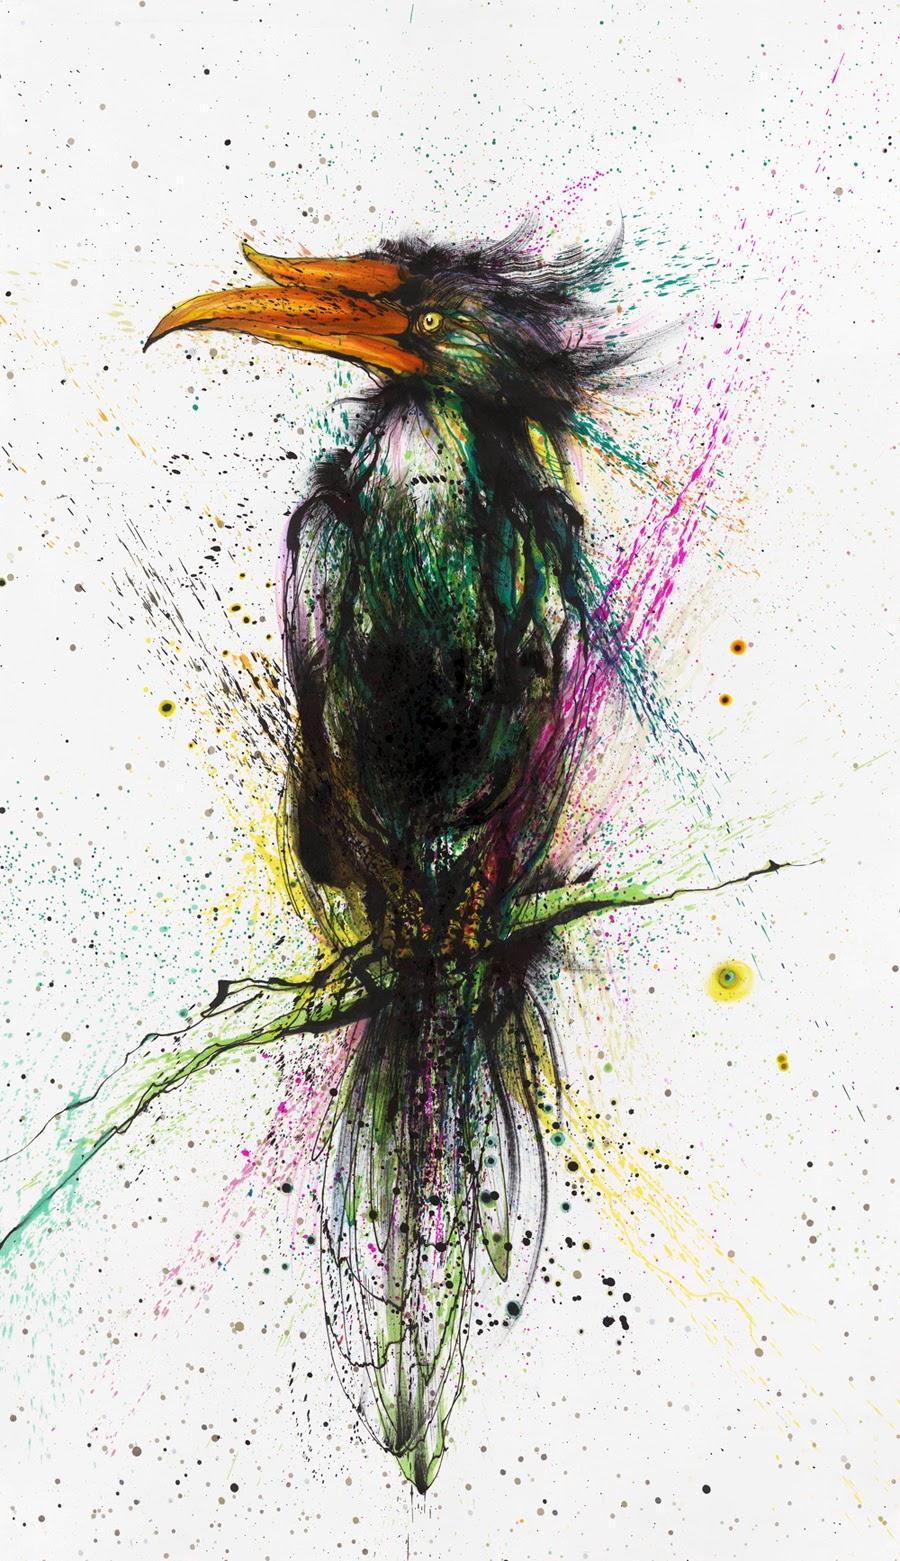 15-Toucan-1-Hua-Tunan-huatunan-Melting-&-Running-Ink-Drawings-www-designstack-co